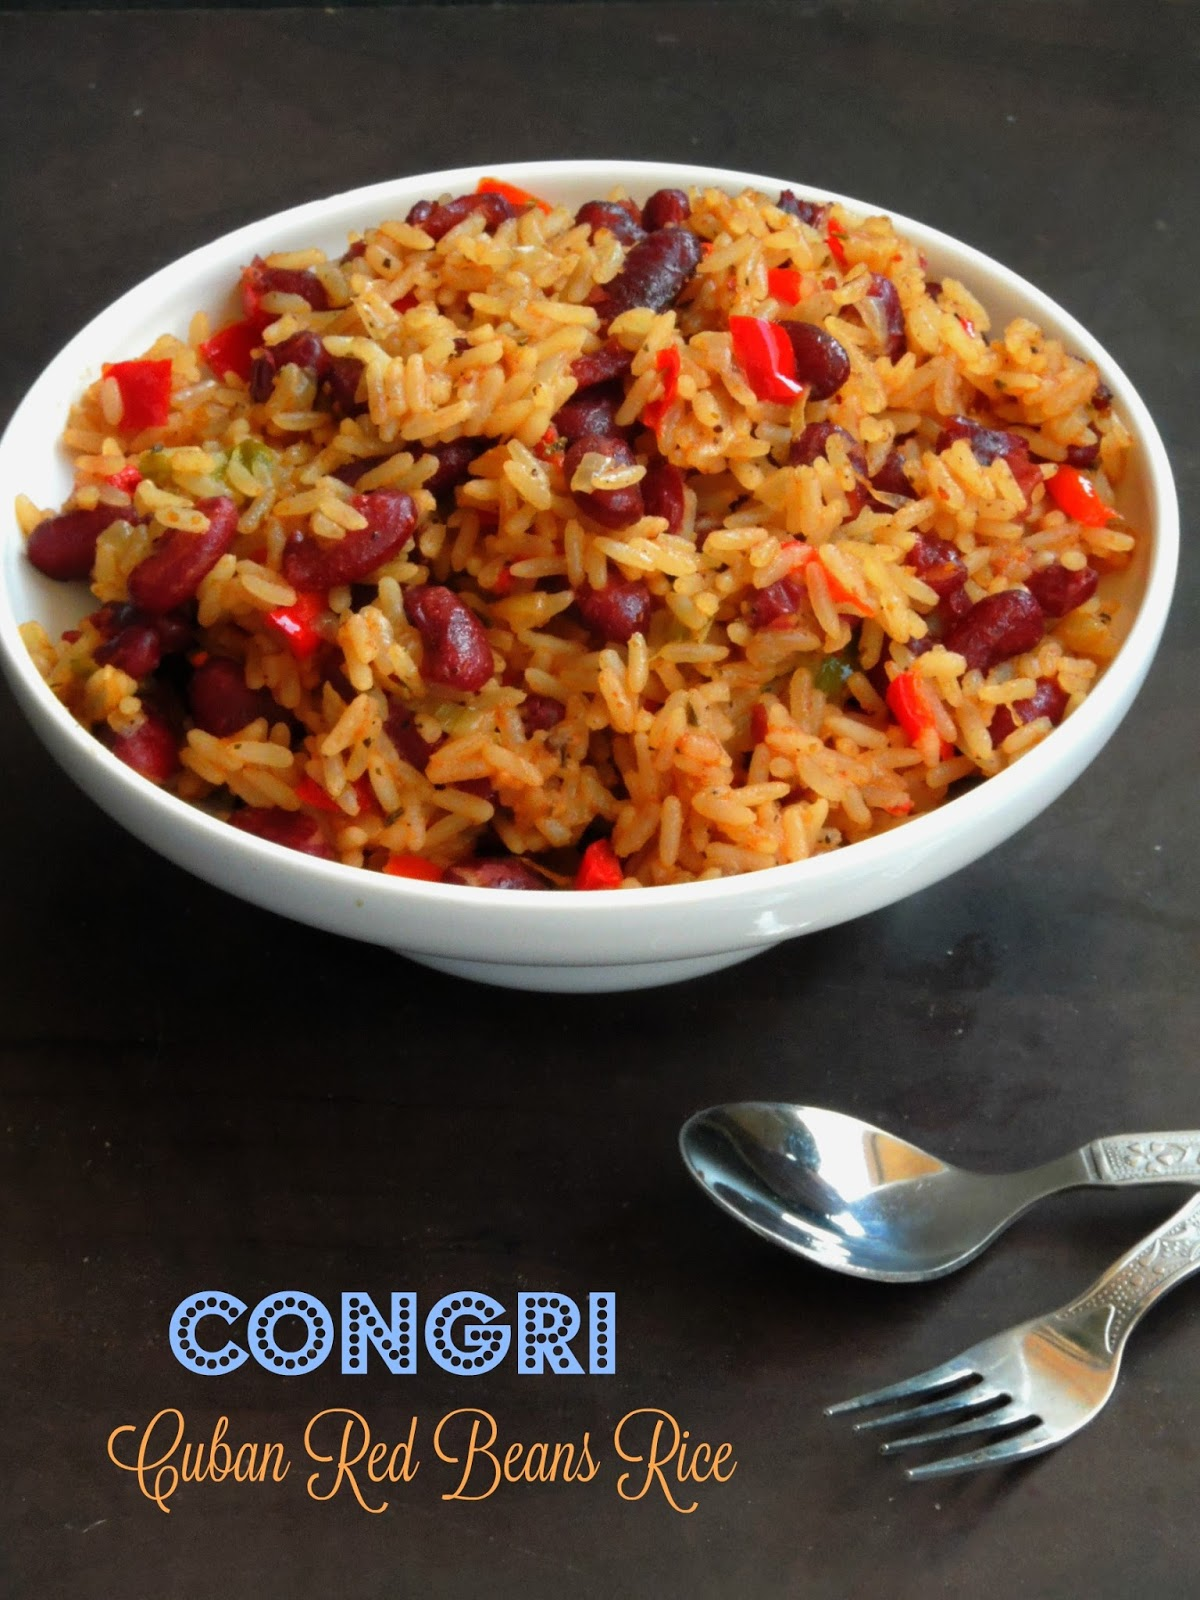 ... Versatile Recipes: Arroz Congri/Vegan Cuban Red Kidney Beans Rice